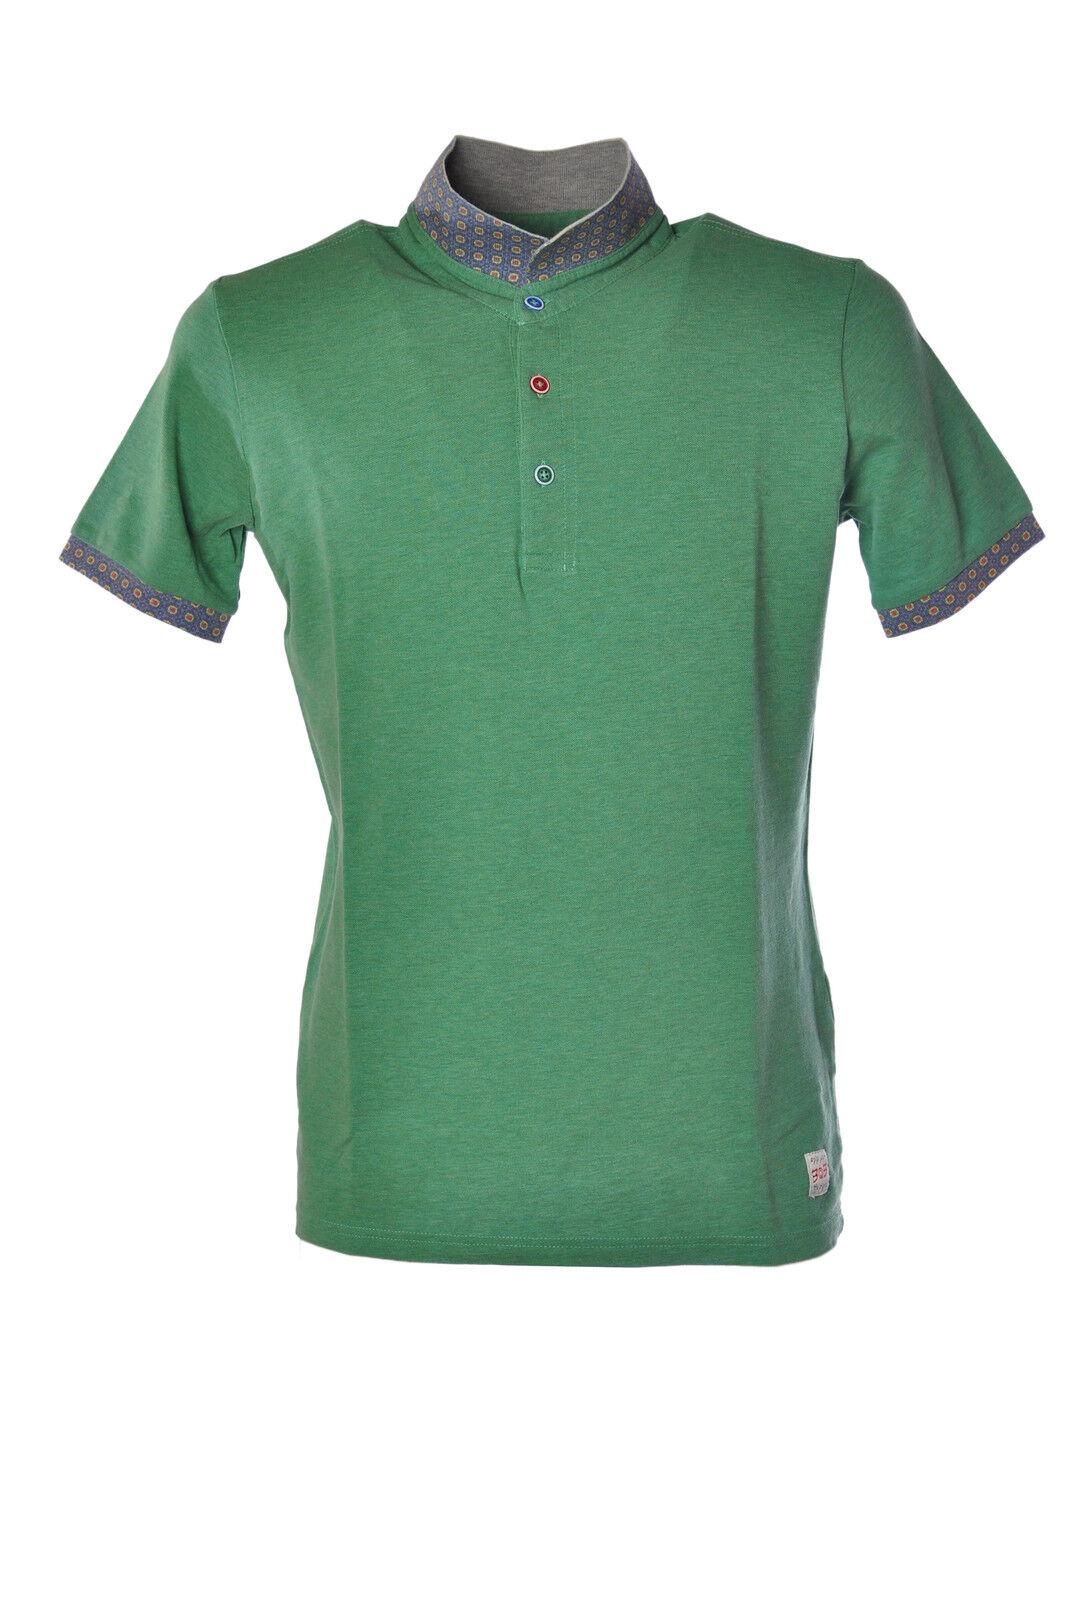 Bob  -  Polo - Male - XXL - Green - 1744418C163656